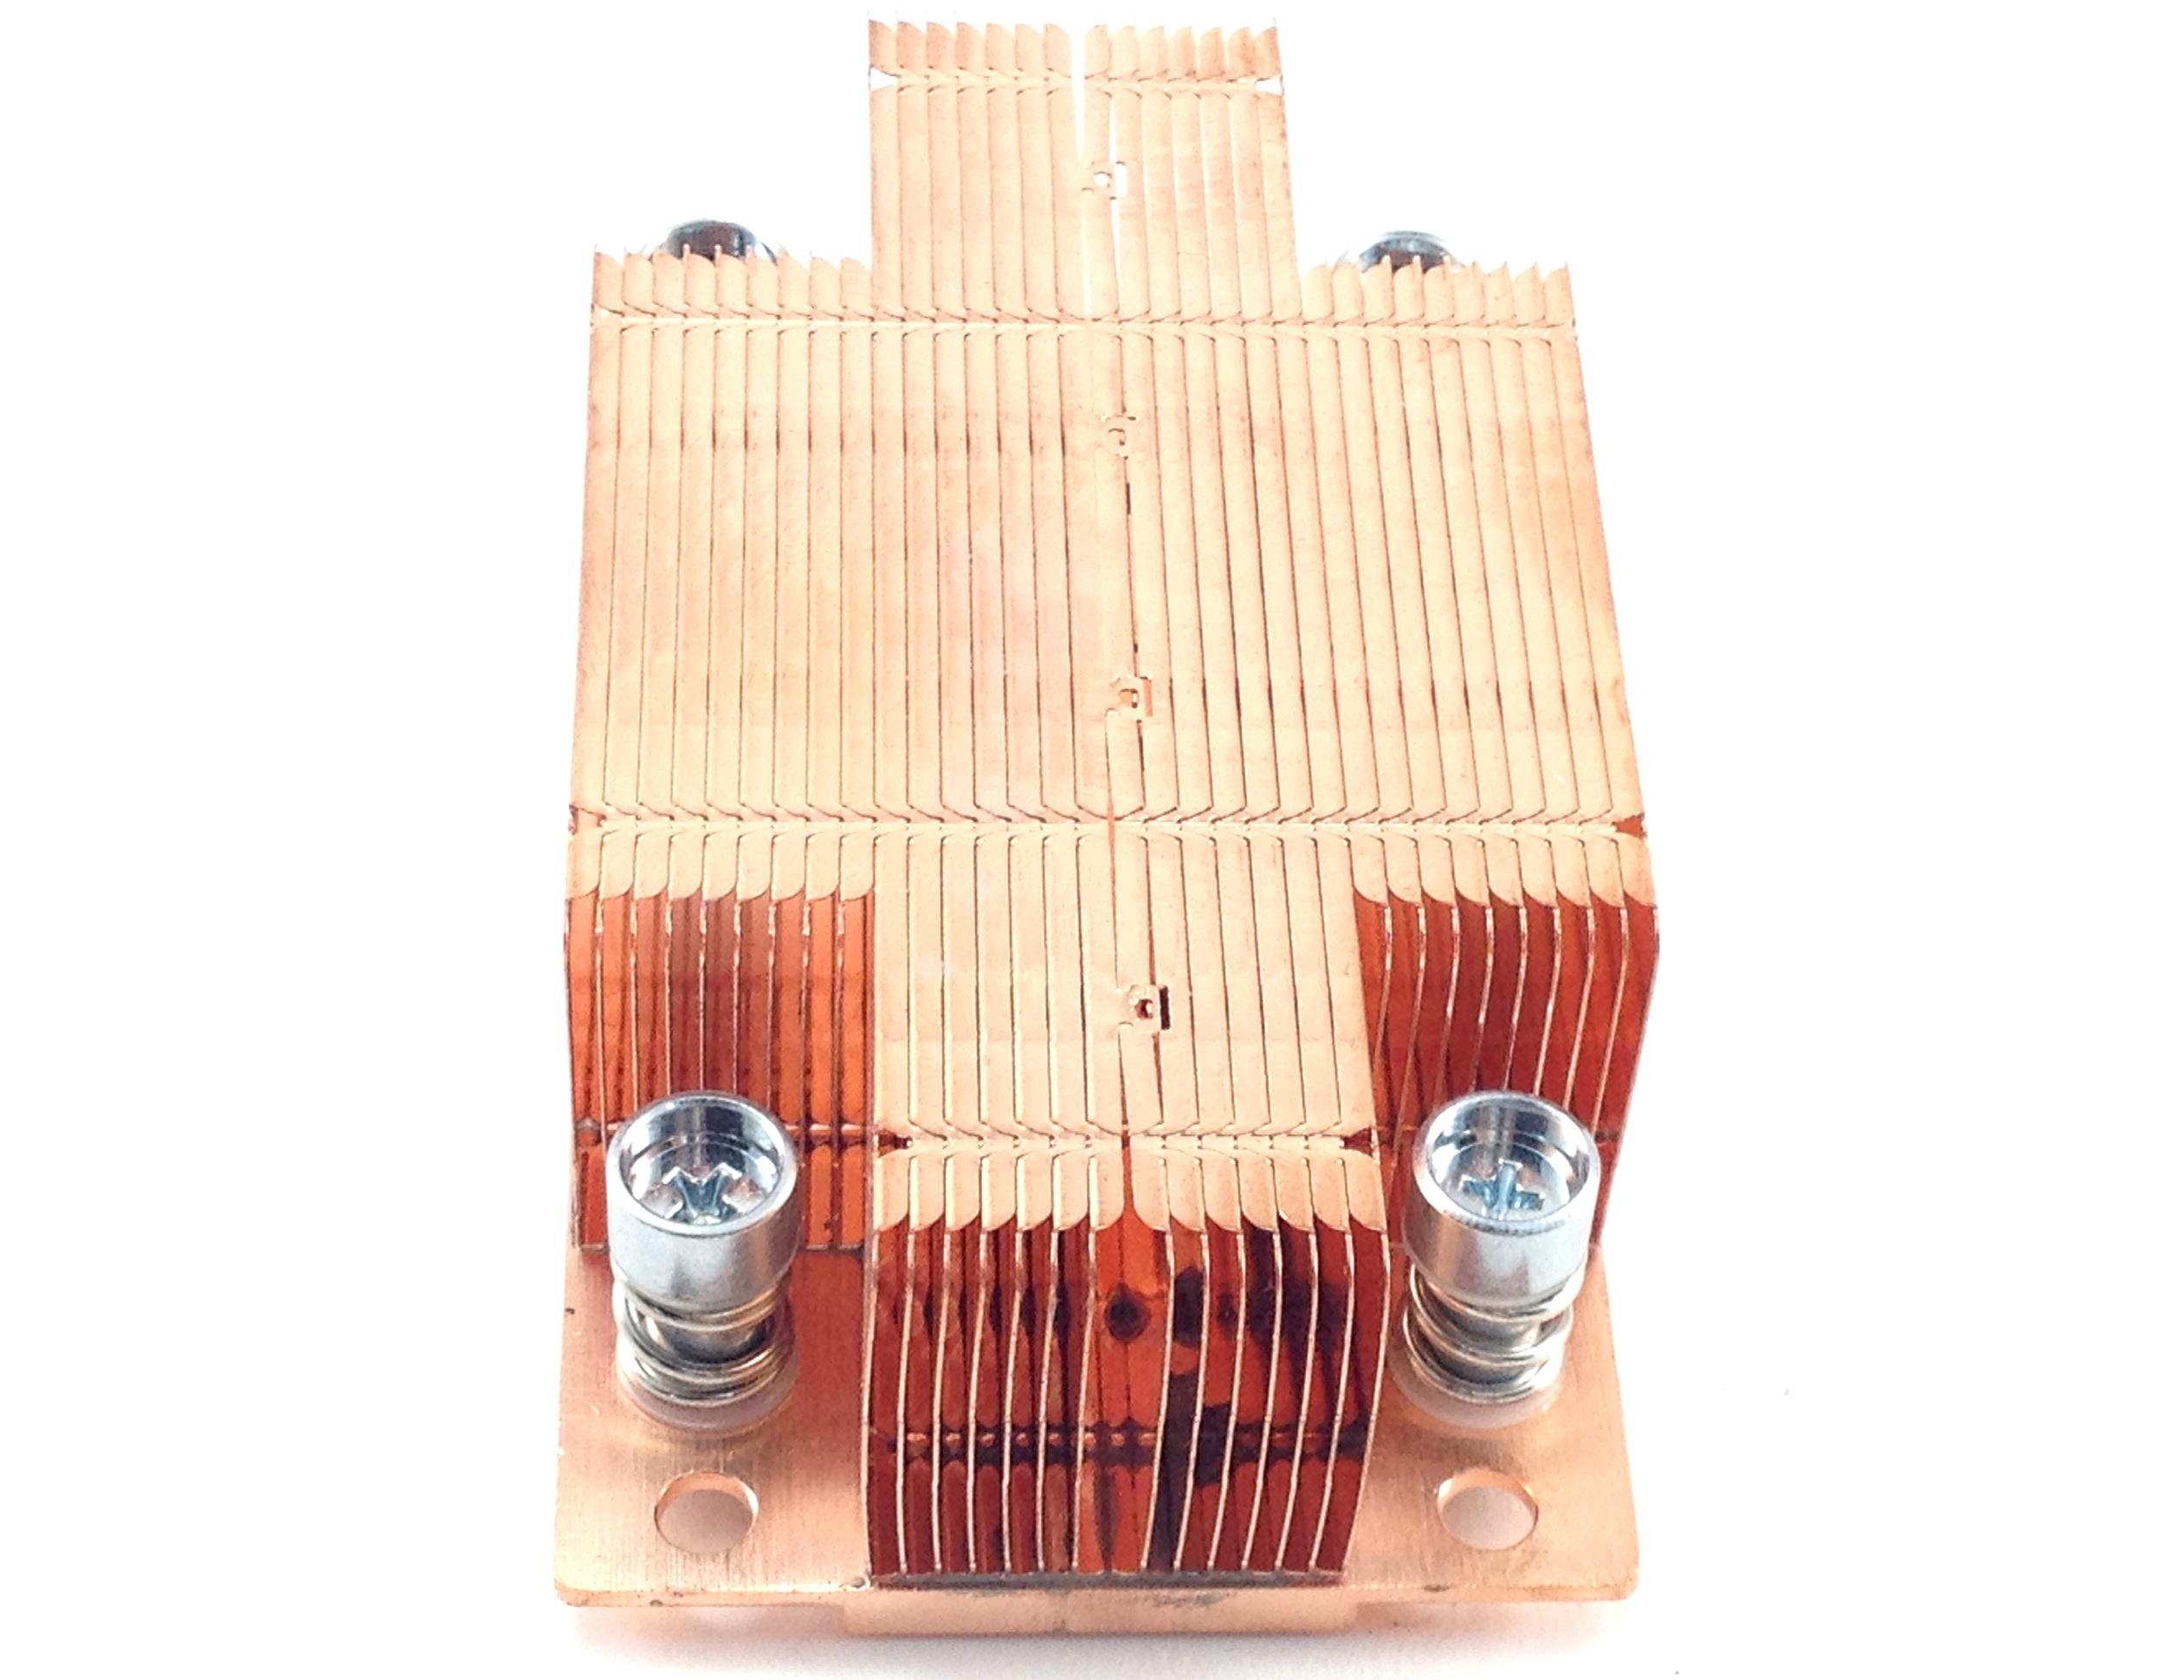 Dell PowerEdge M620 Blade Server Copper Heat Sink (D8846)